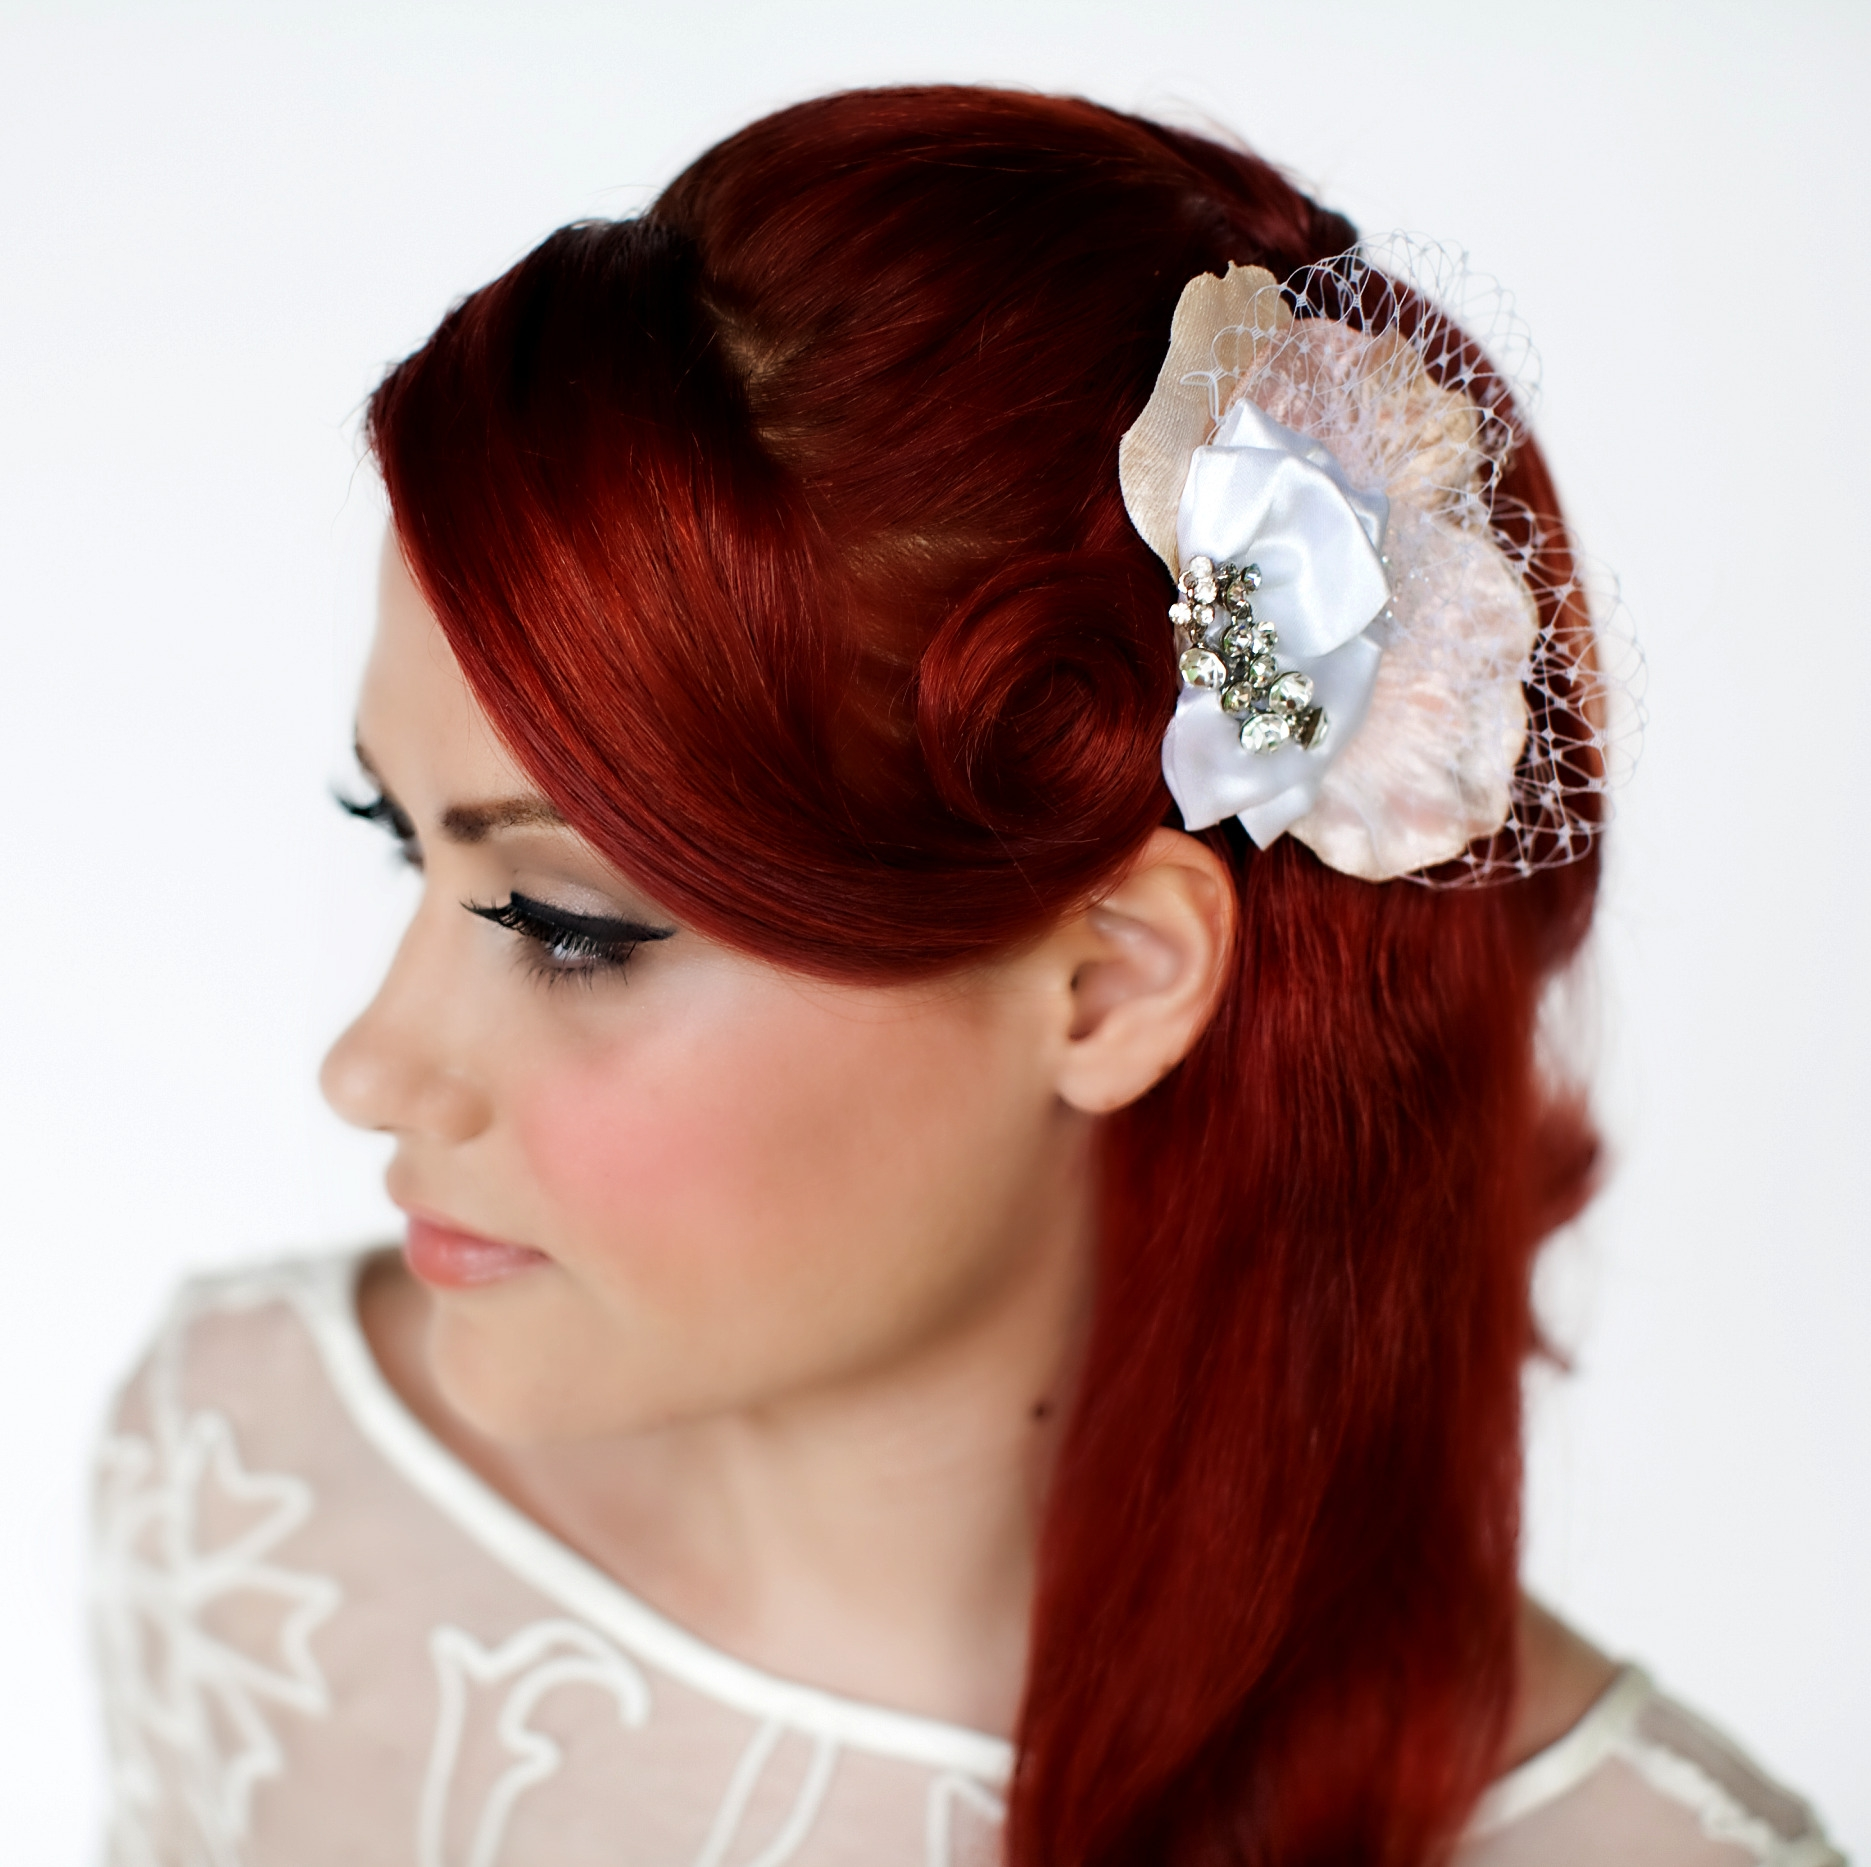 Stunning Bridal Hair Accessory Sculptured Fabric Flower